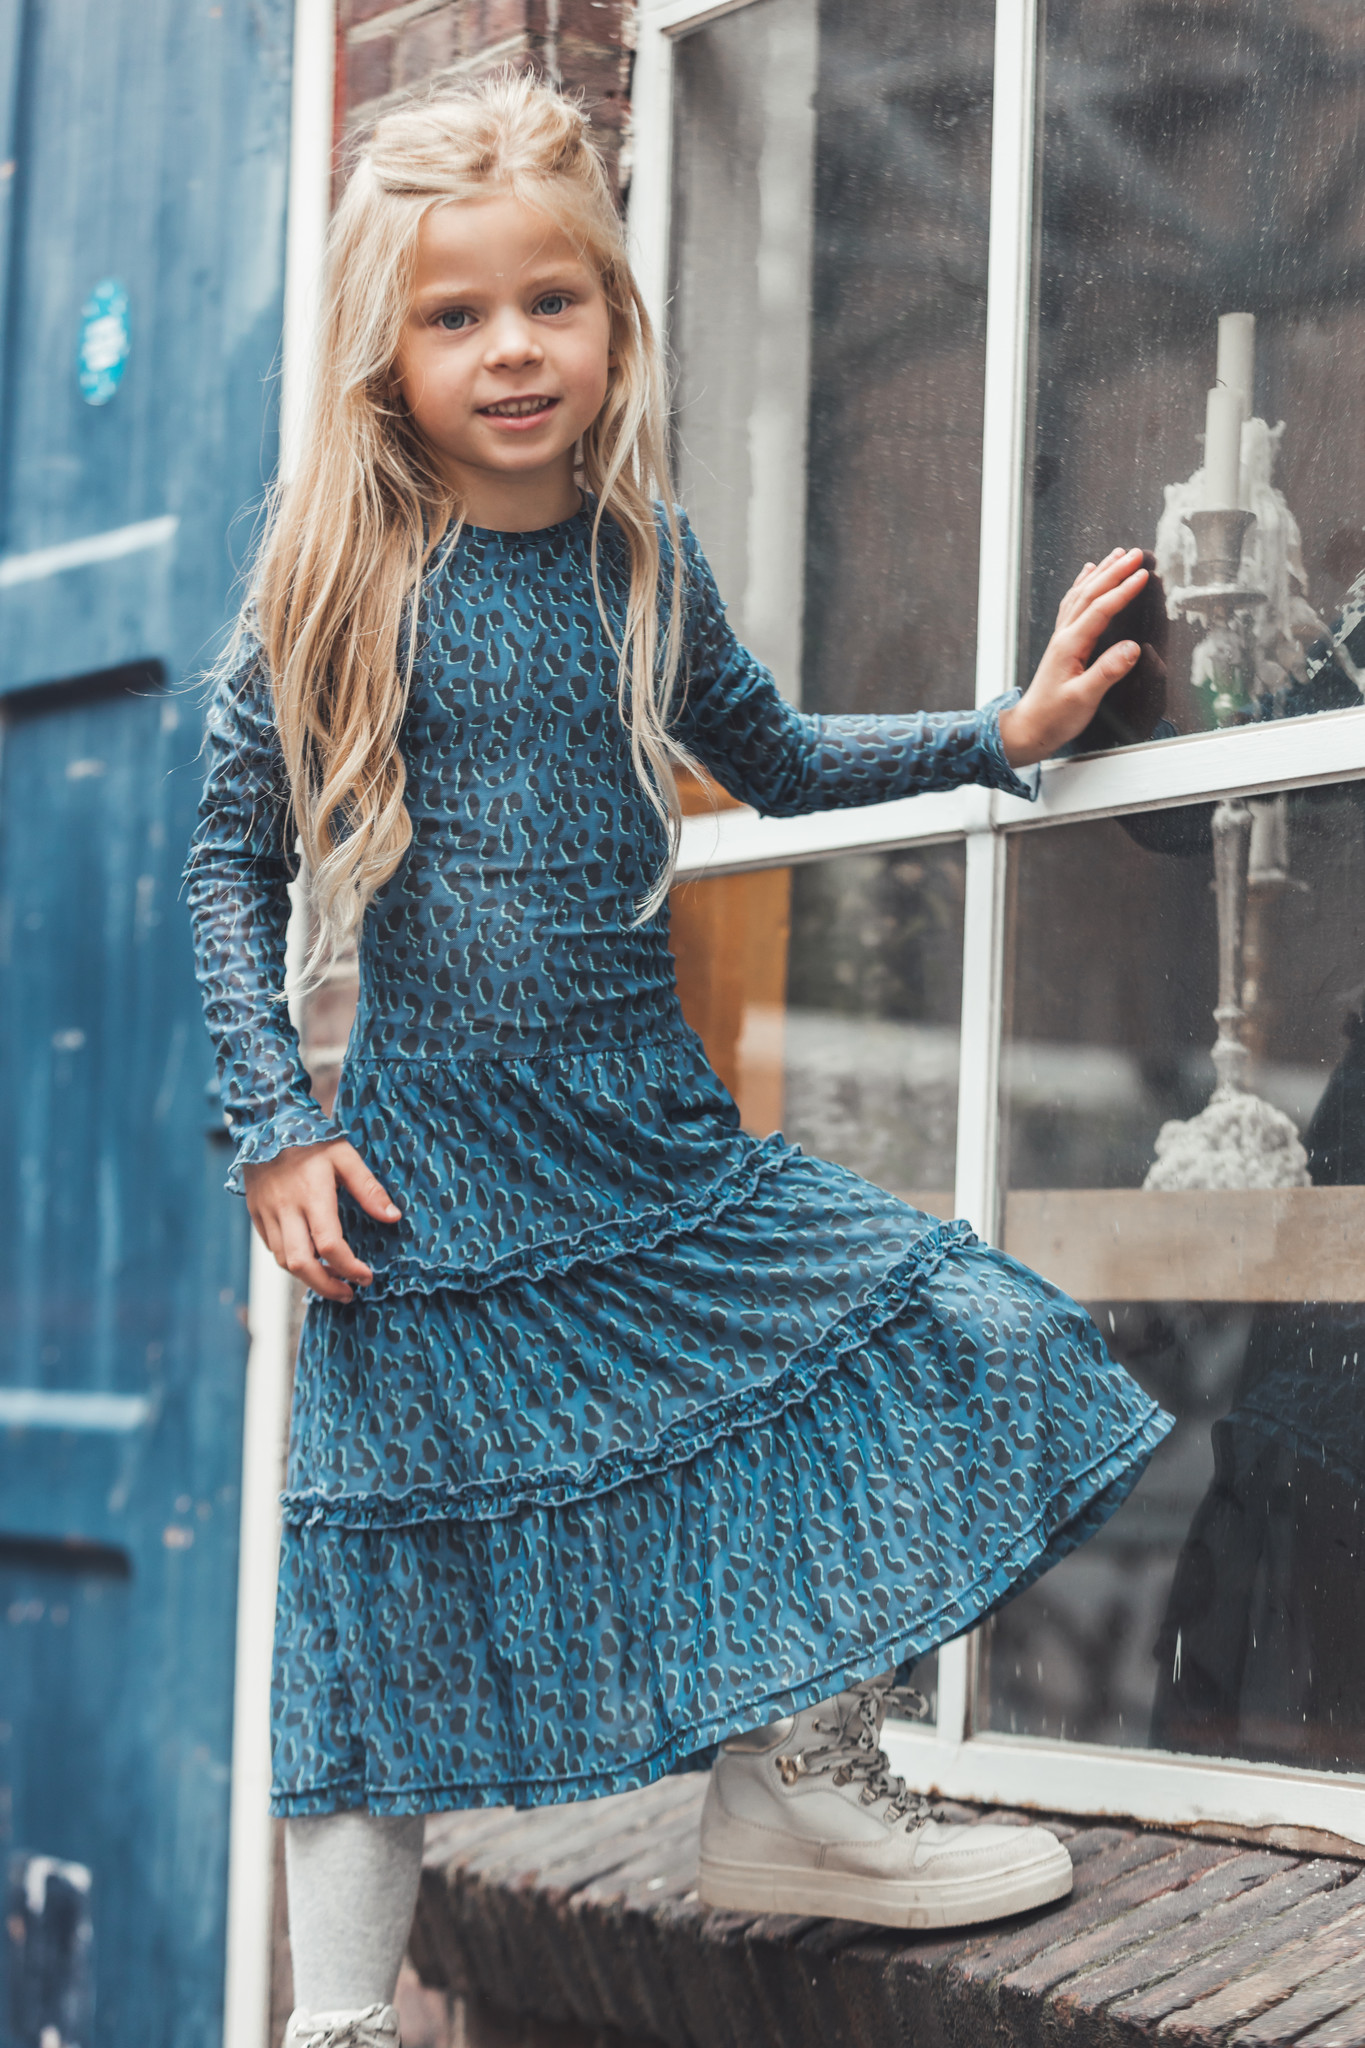 Mayce Girlslabel lookbook winter 2022-26